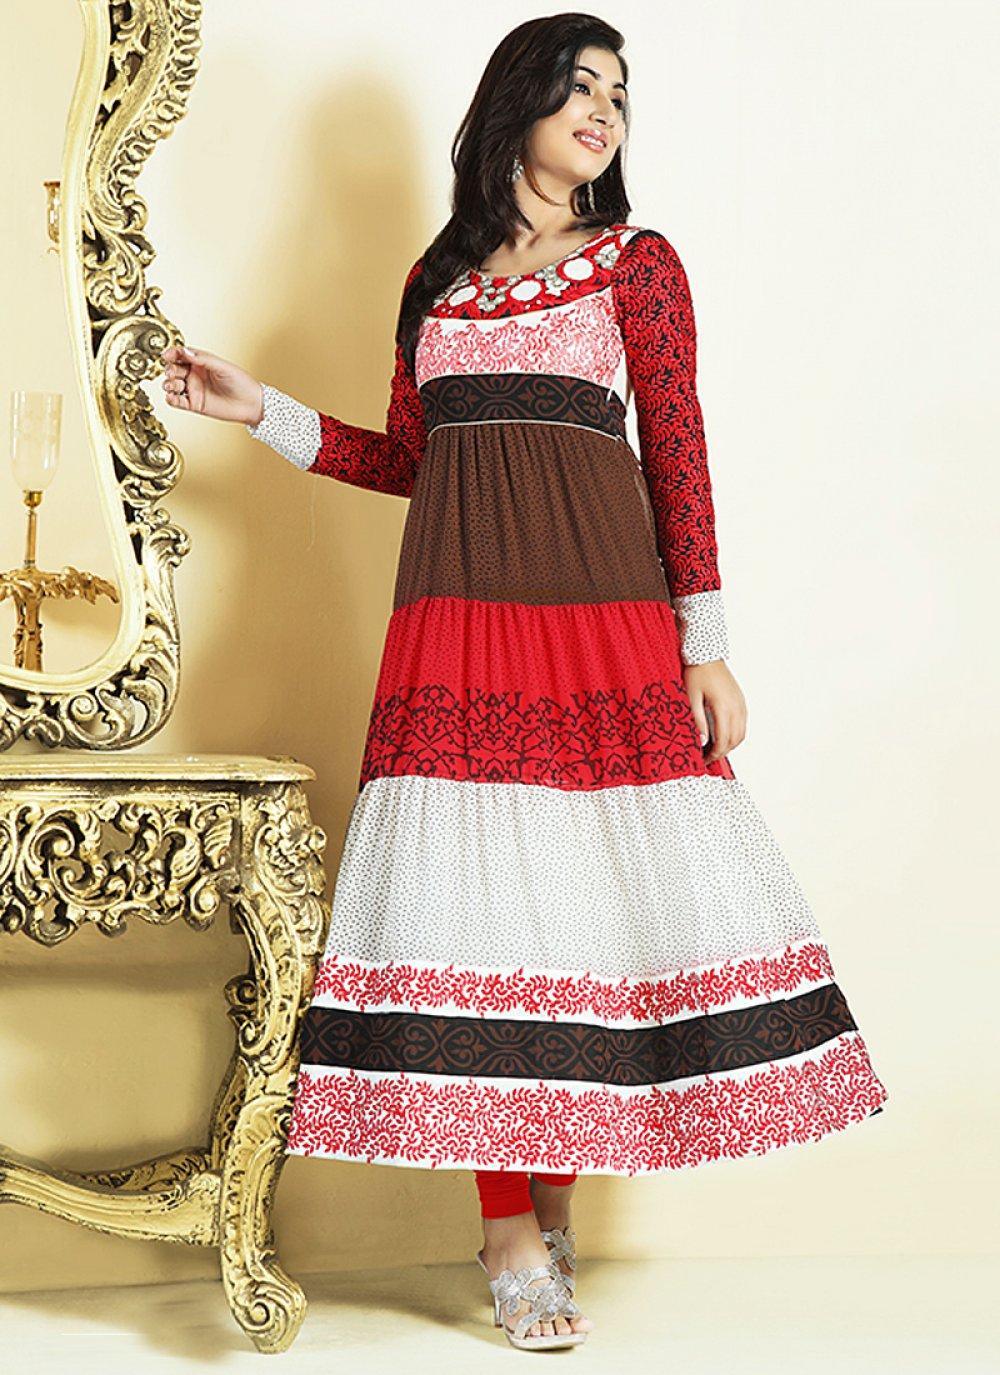 Multicolor Resham Work Faux Georgette Anarkali Suit